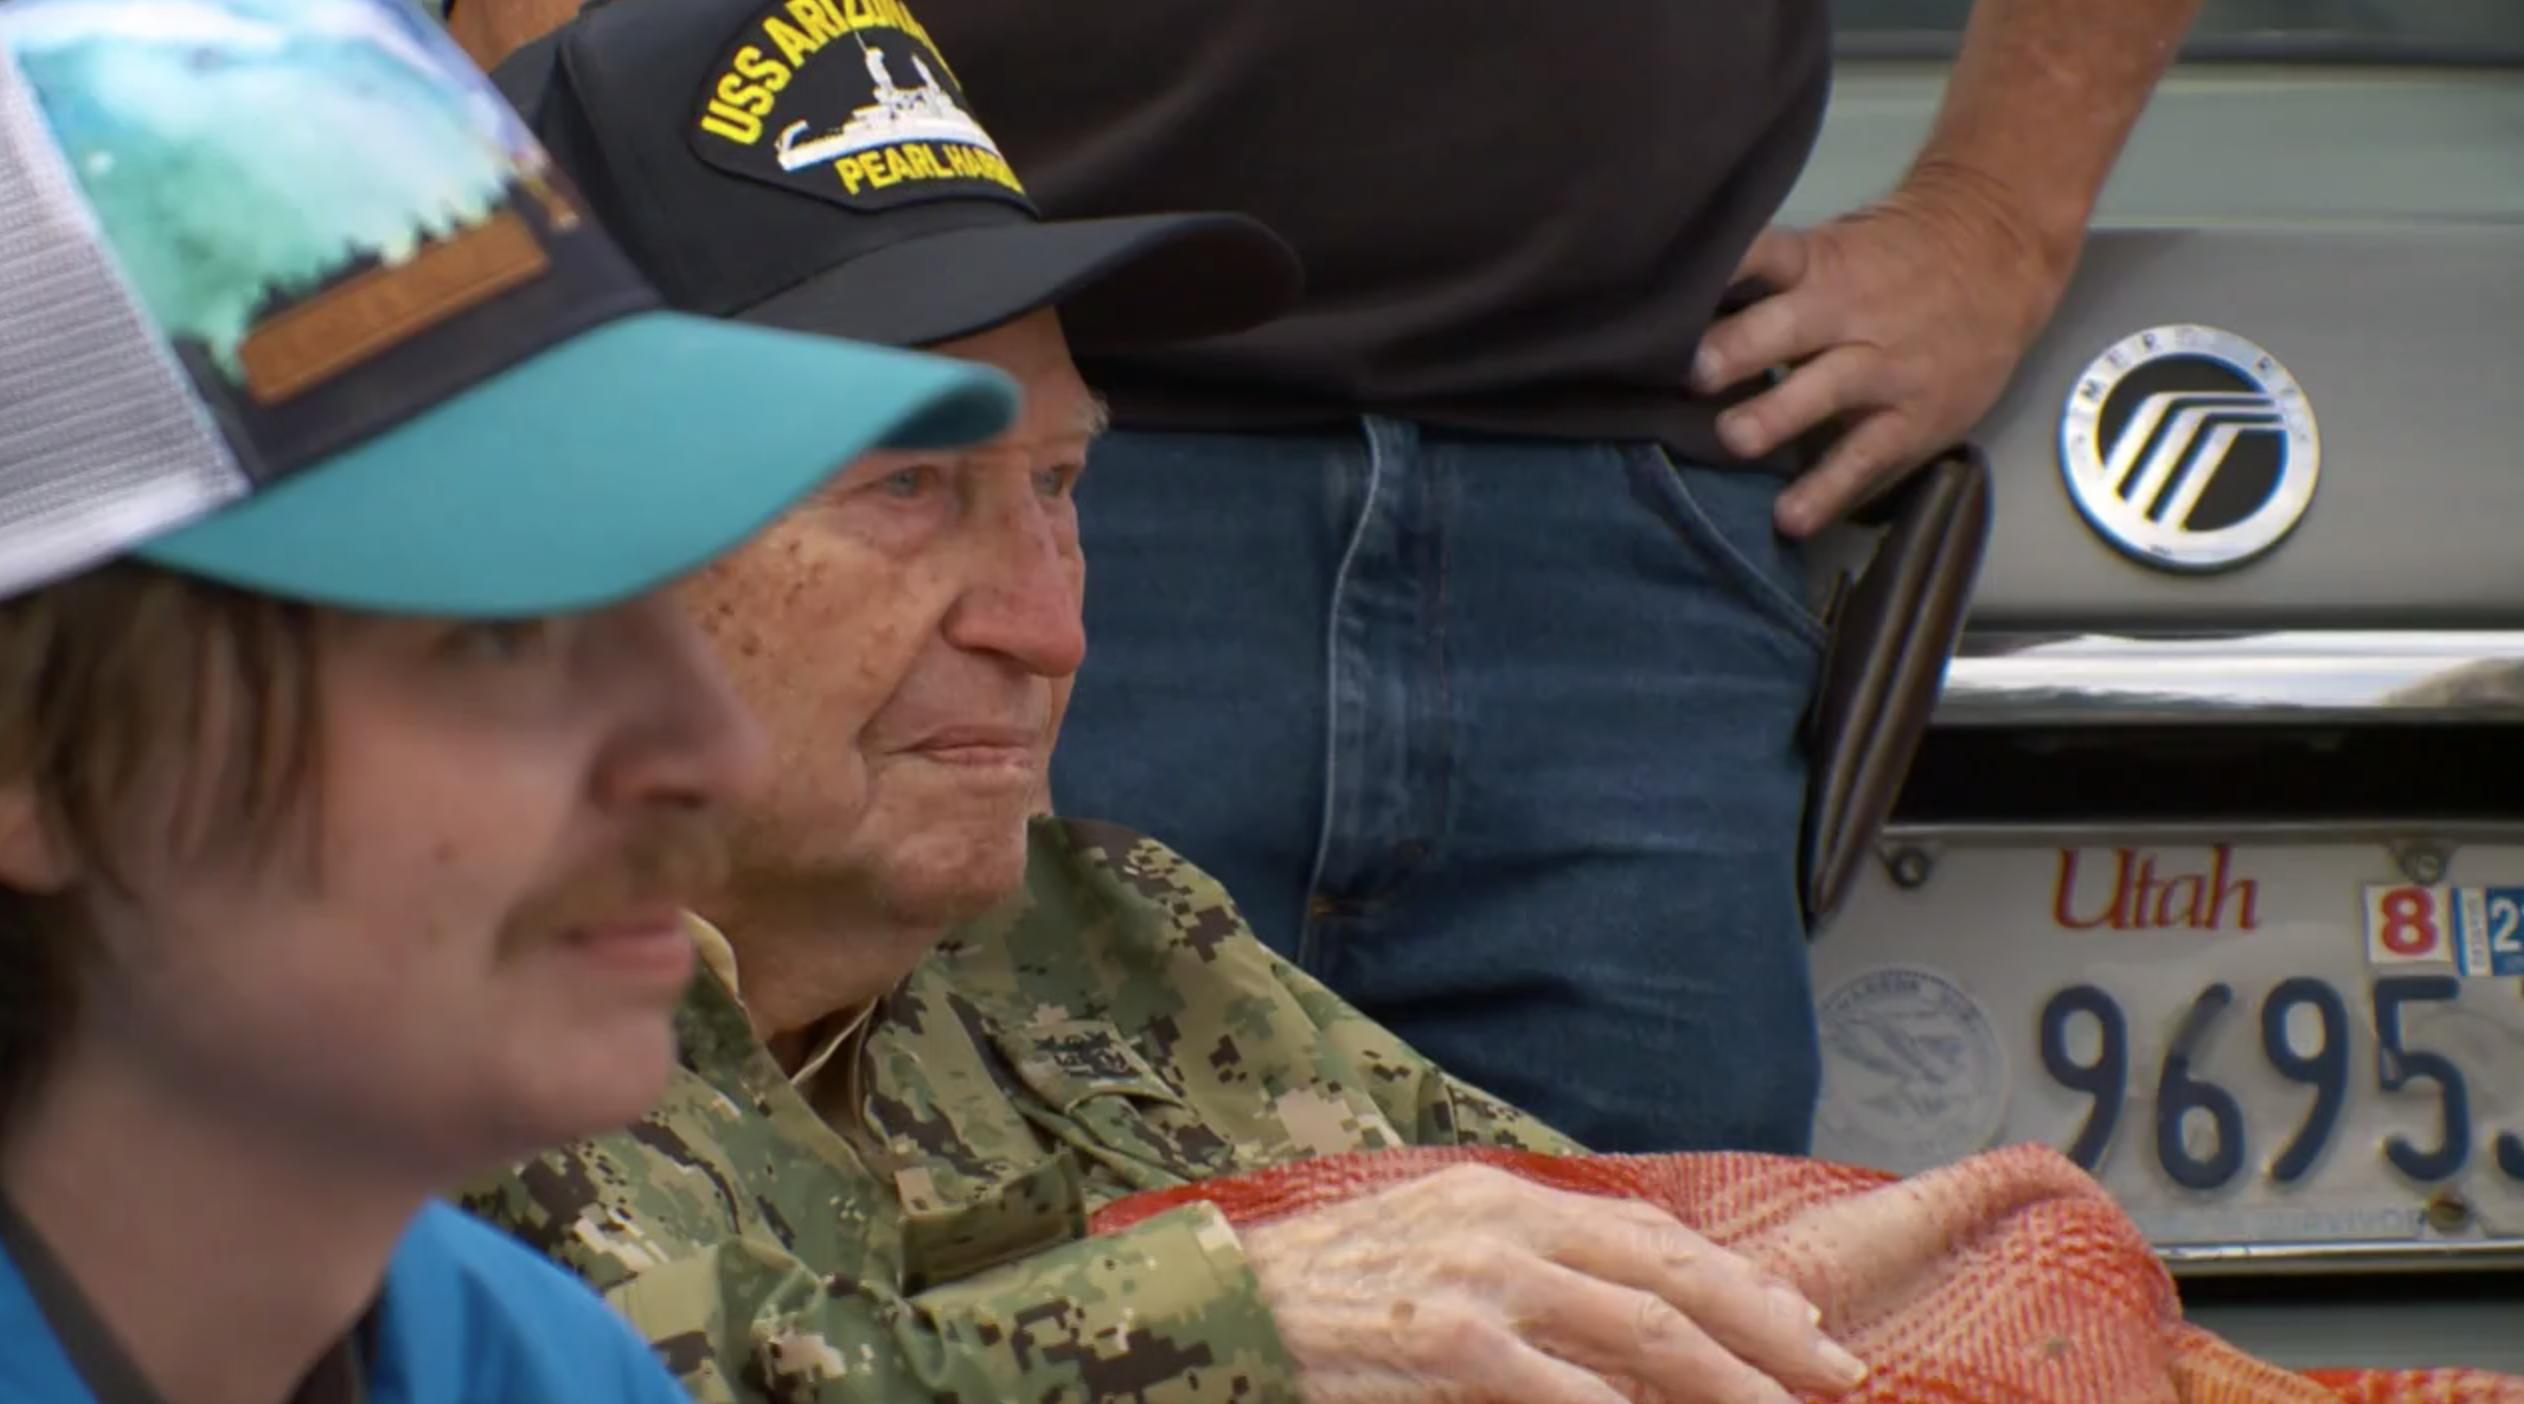 Utah community celebrates 100th birthday of Pearl Harbor survivor